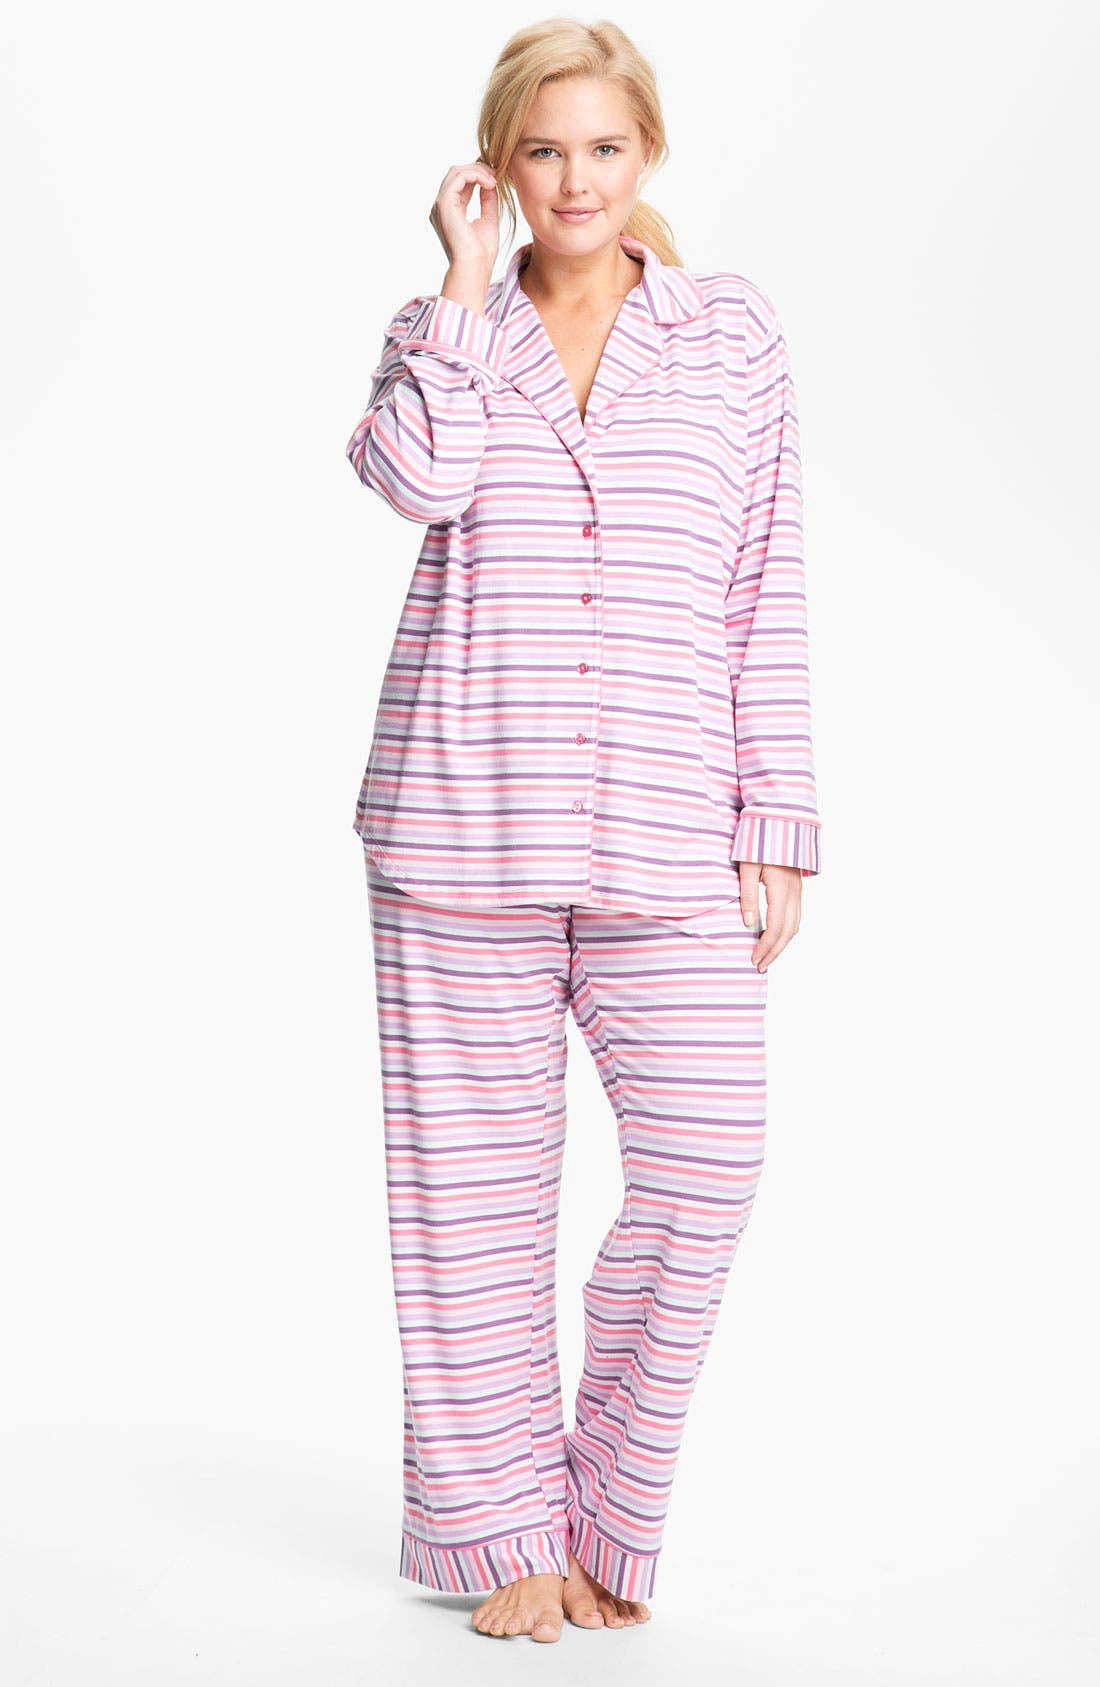 Alternate Image 1 Selected - Nordstrom Knit Pajamas (Plus)